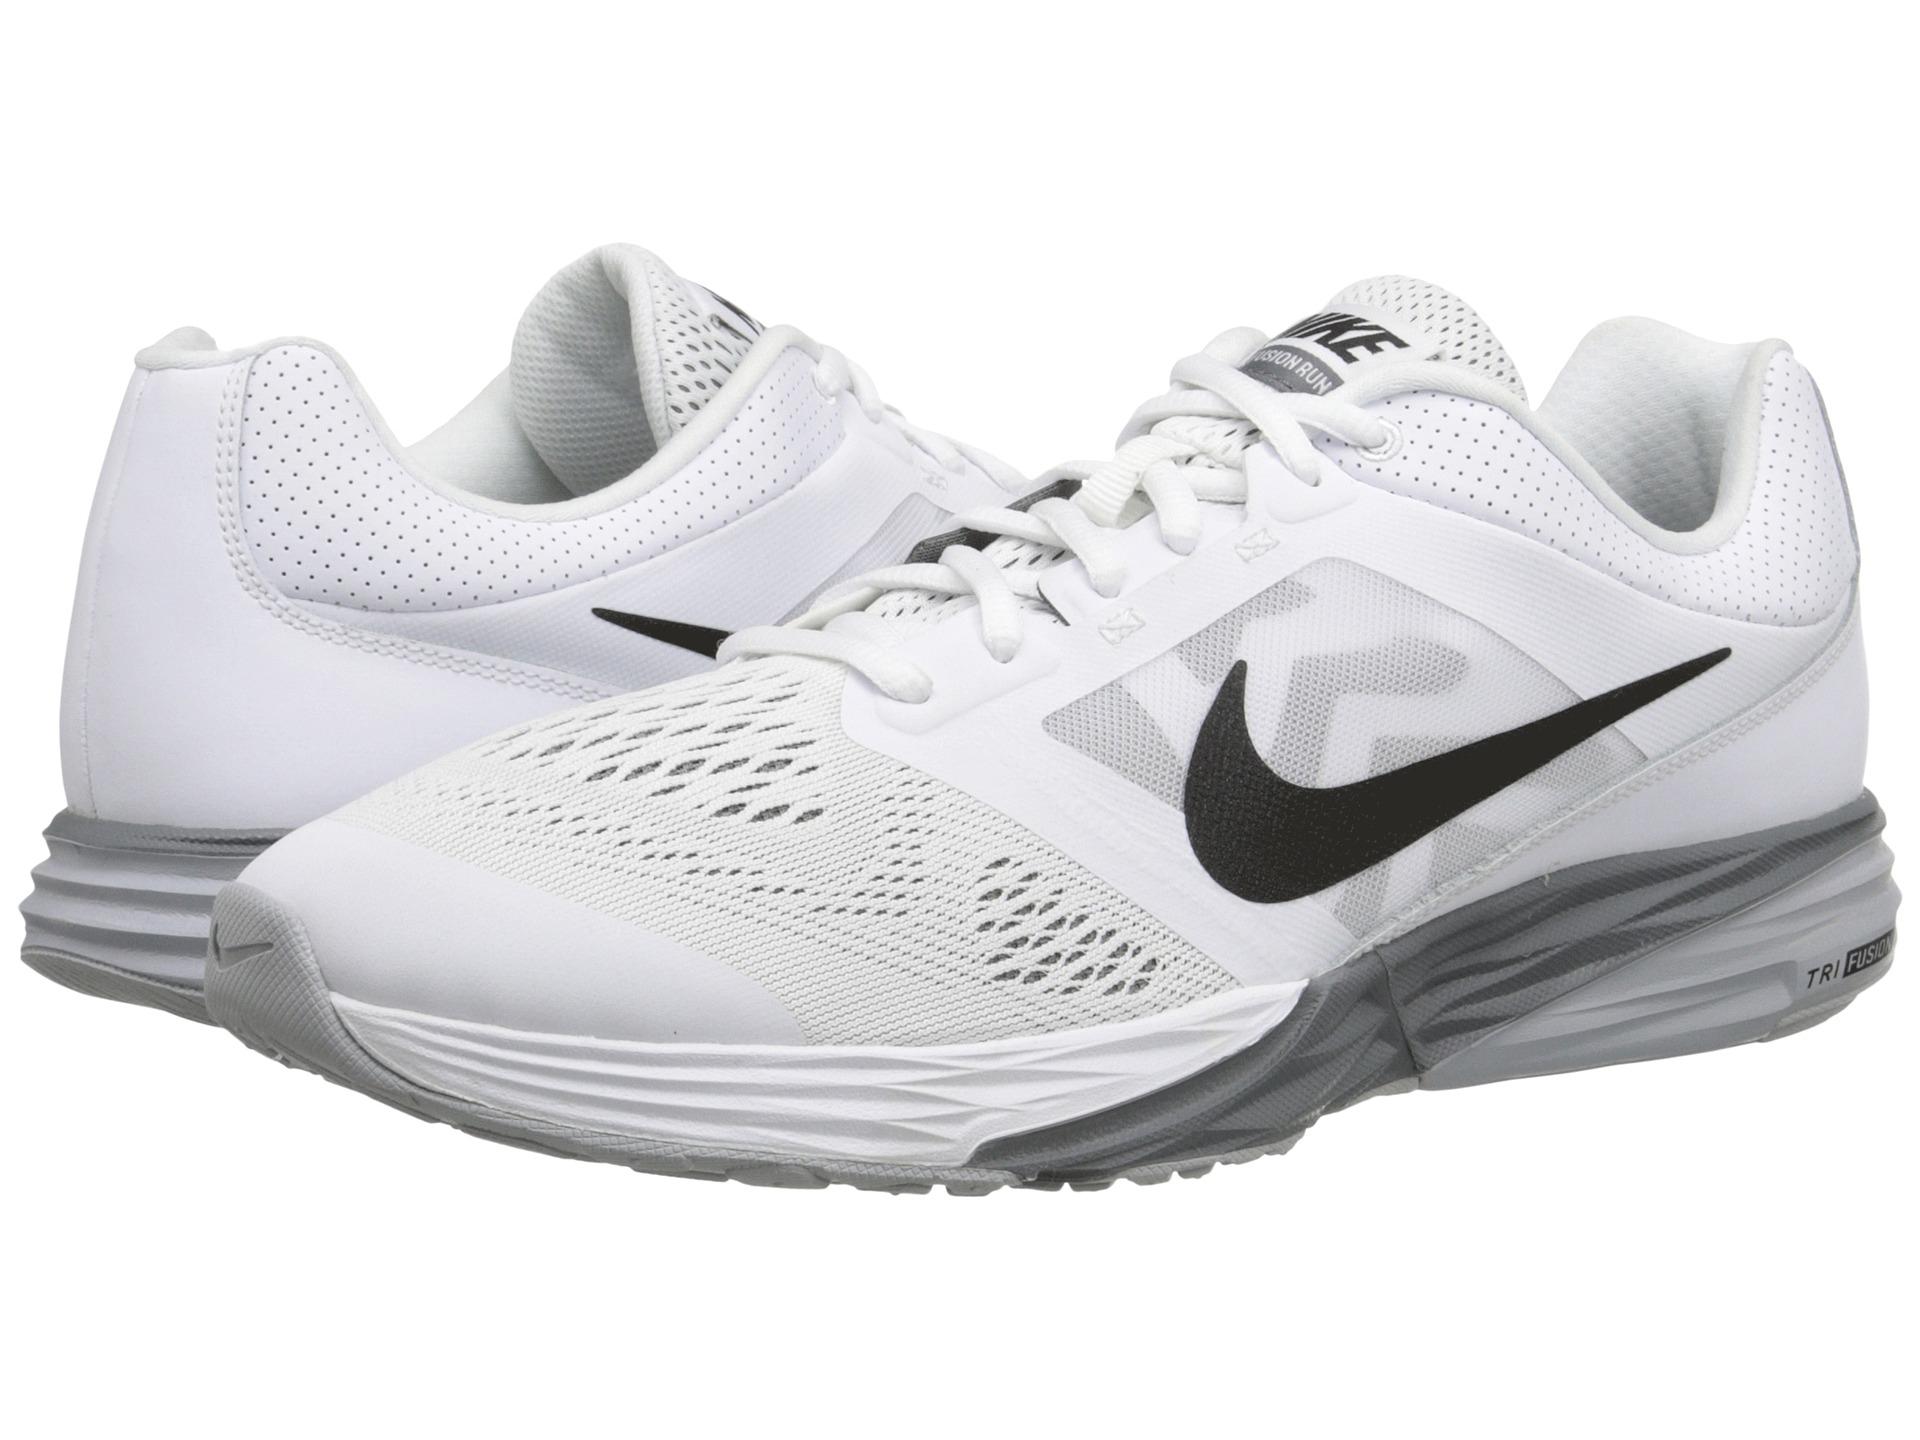 Lyst - Nike Tri Fusion Run in White for Men 08bf4bf62